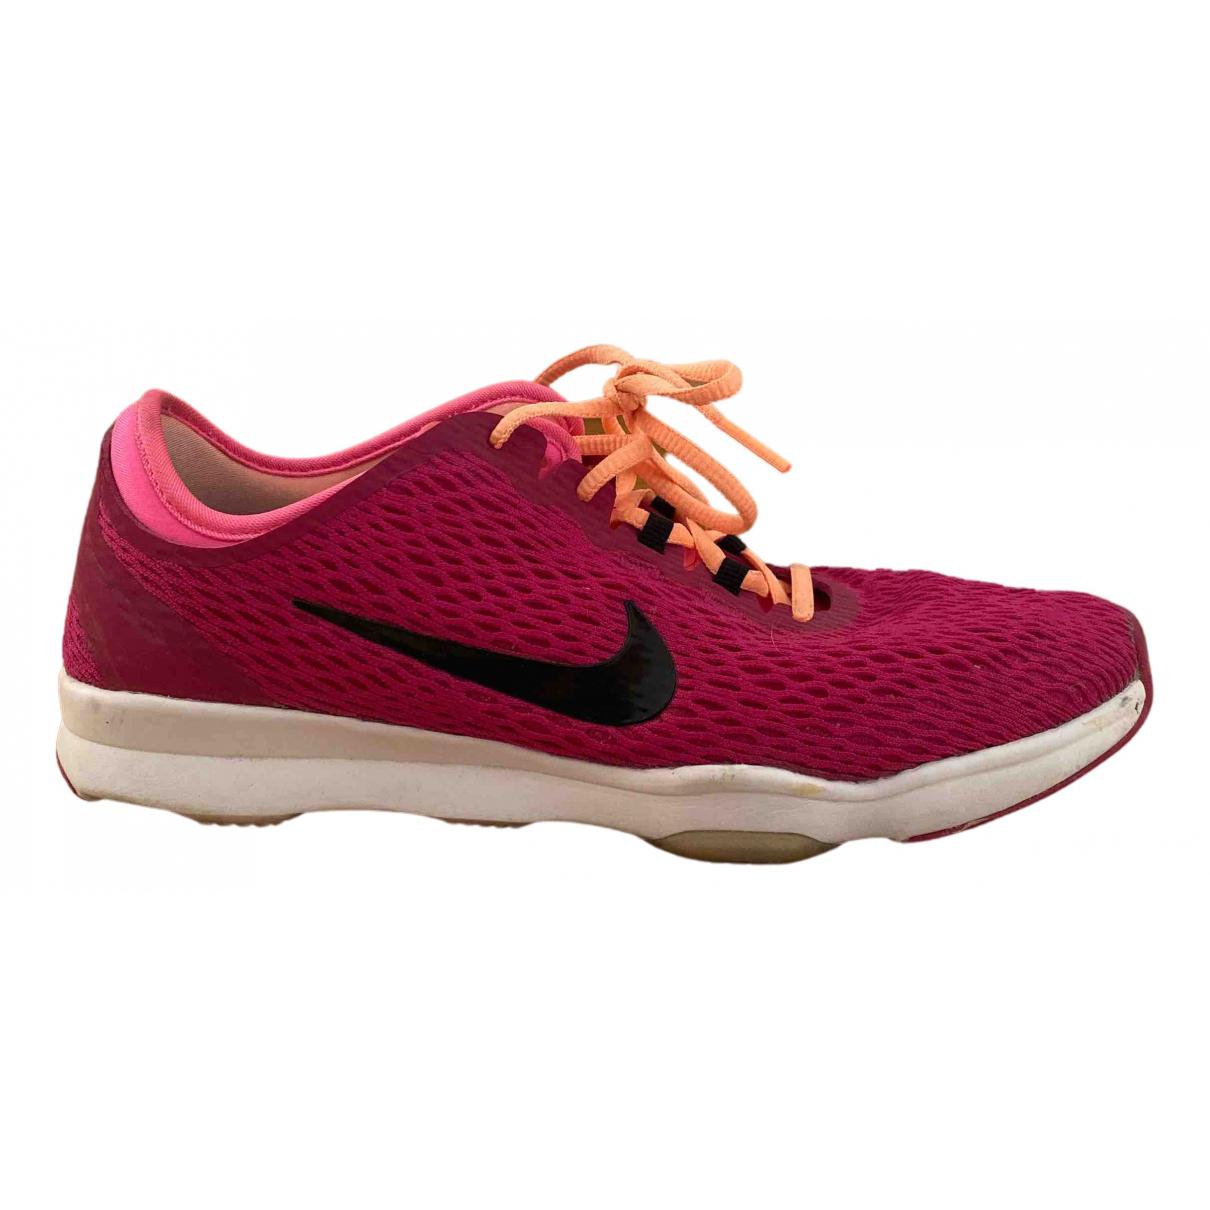 Nike Zoom Pink Cloth Trainers for Women 37.5 EU